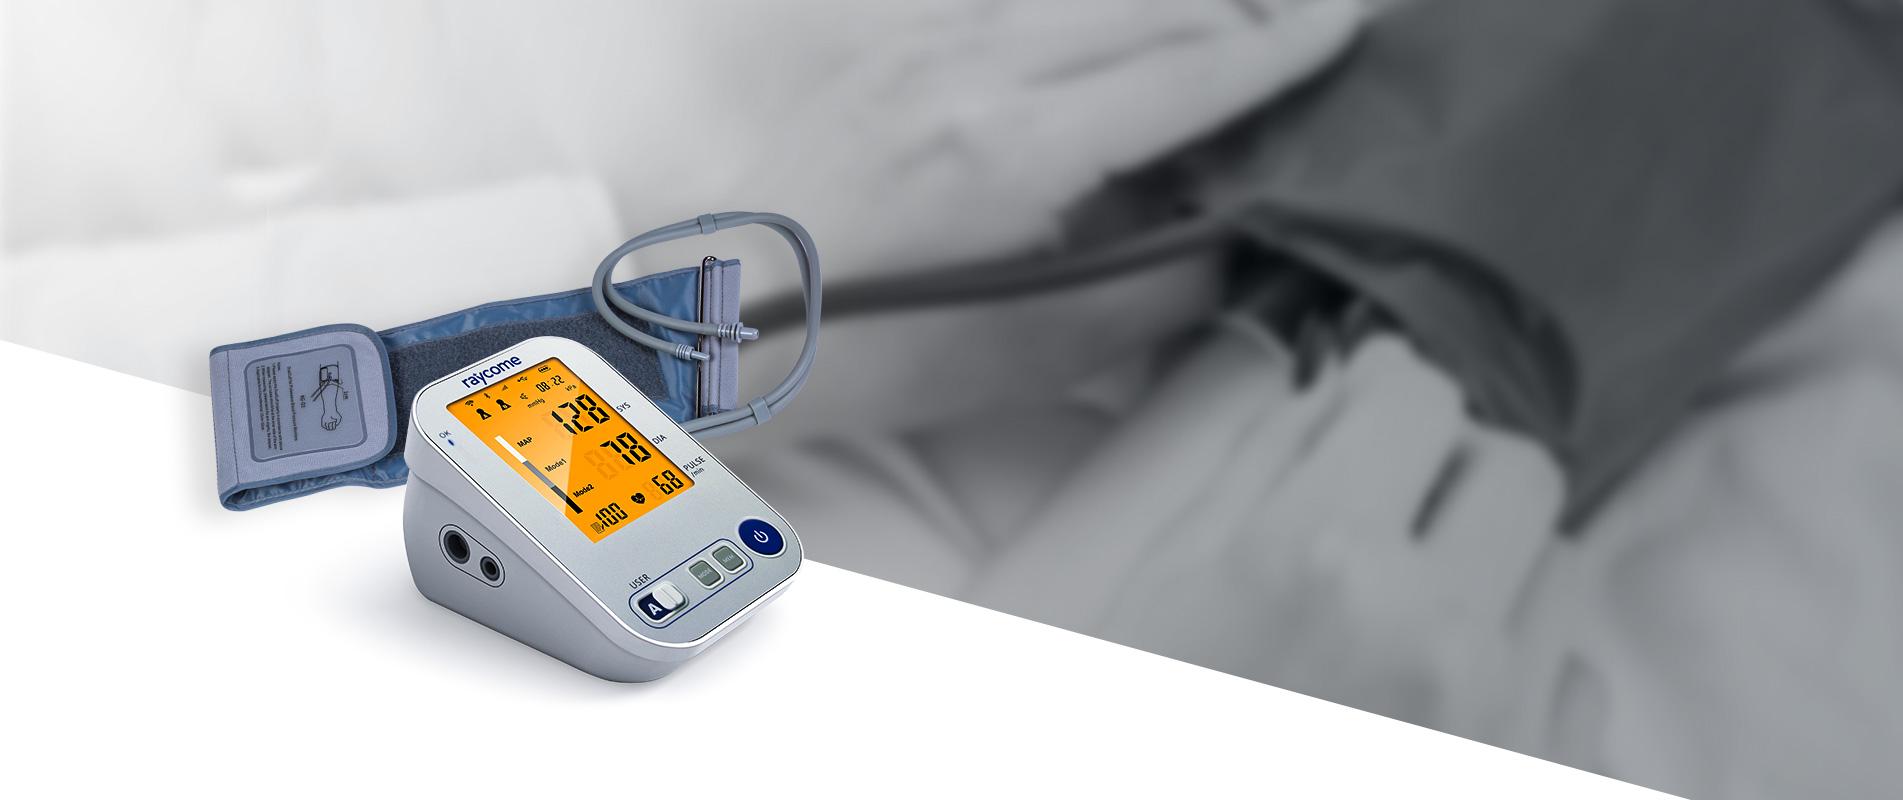 A Raycome blood pressure monitor